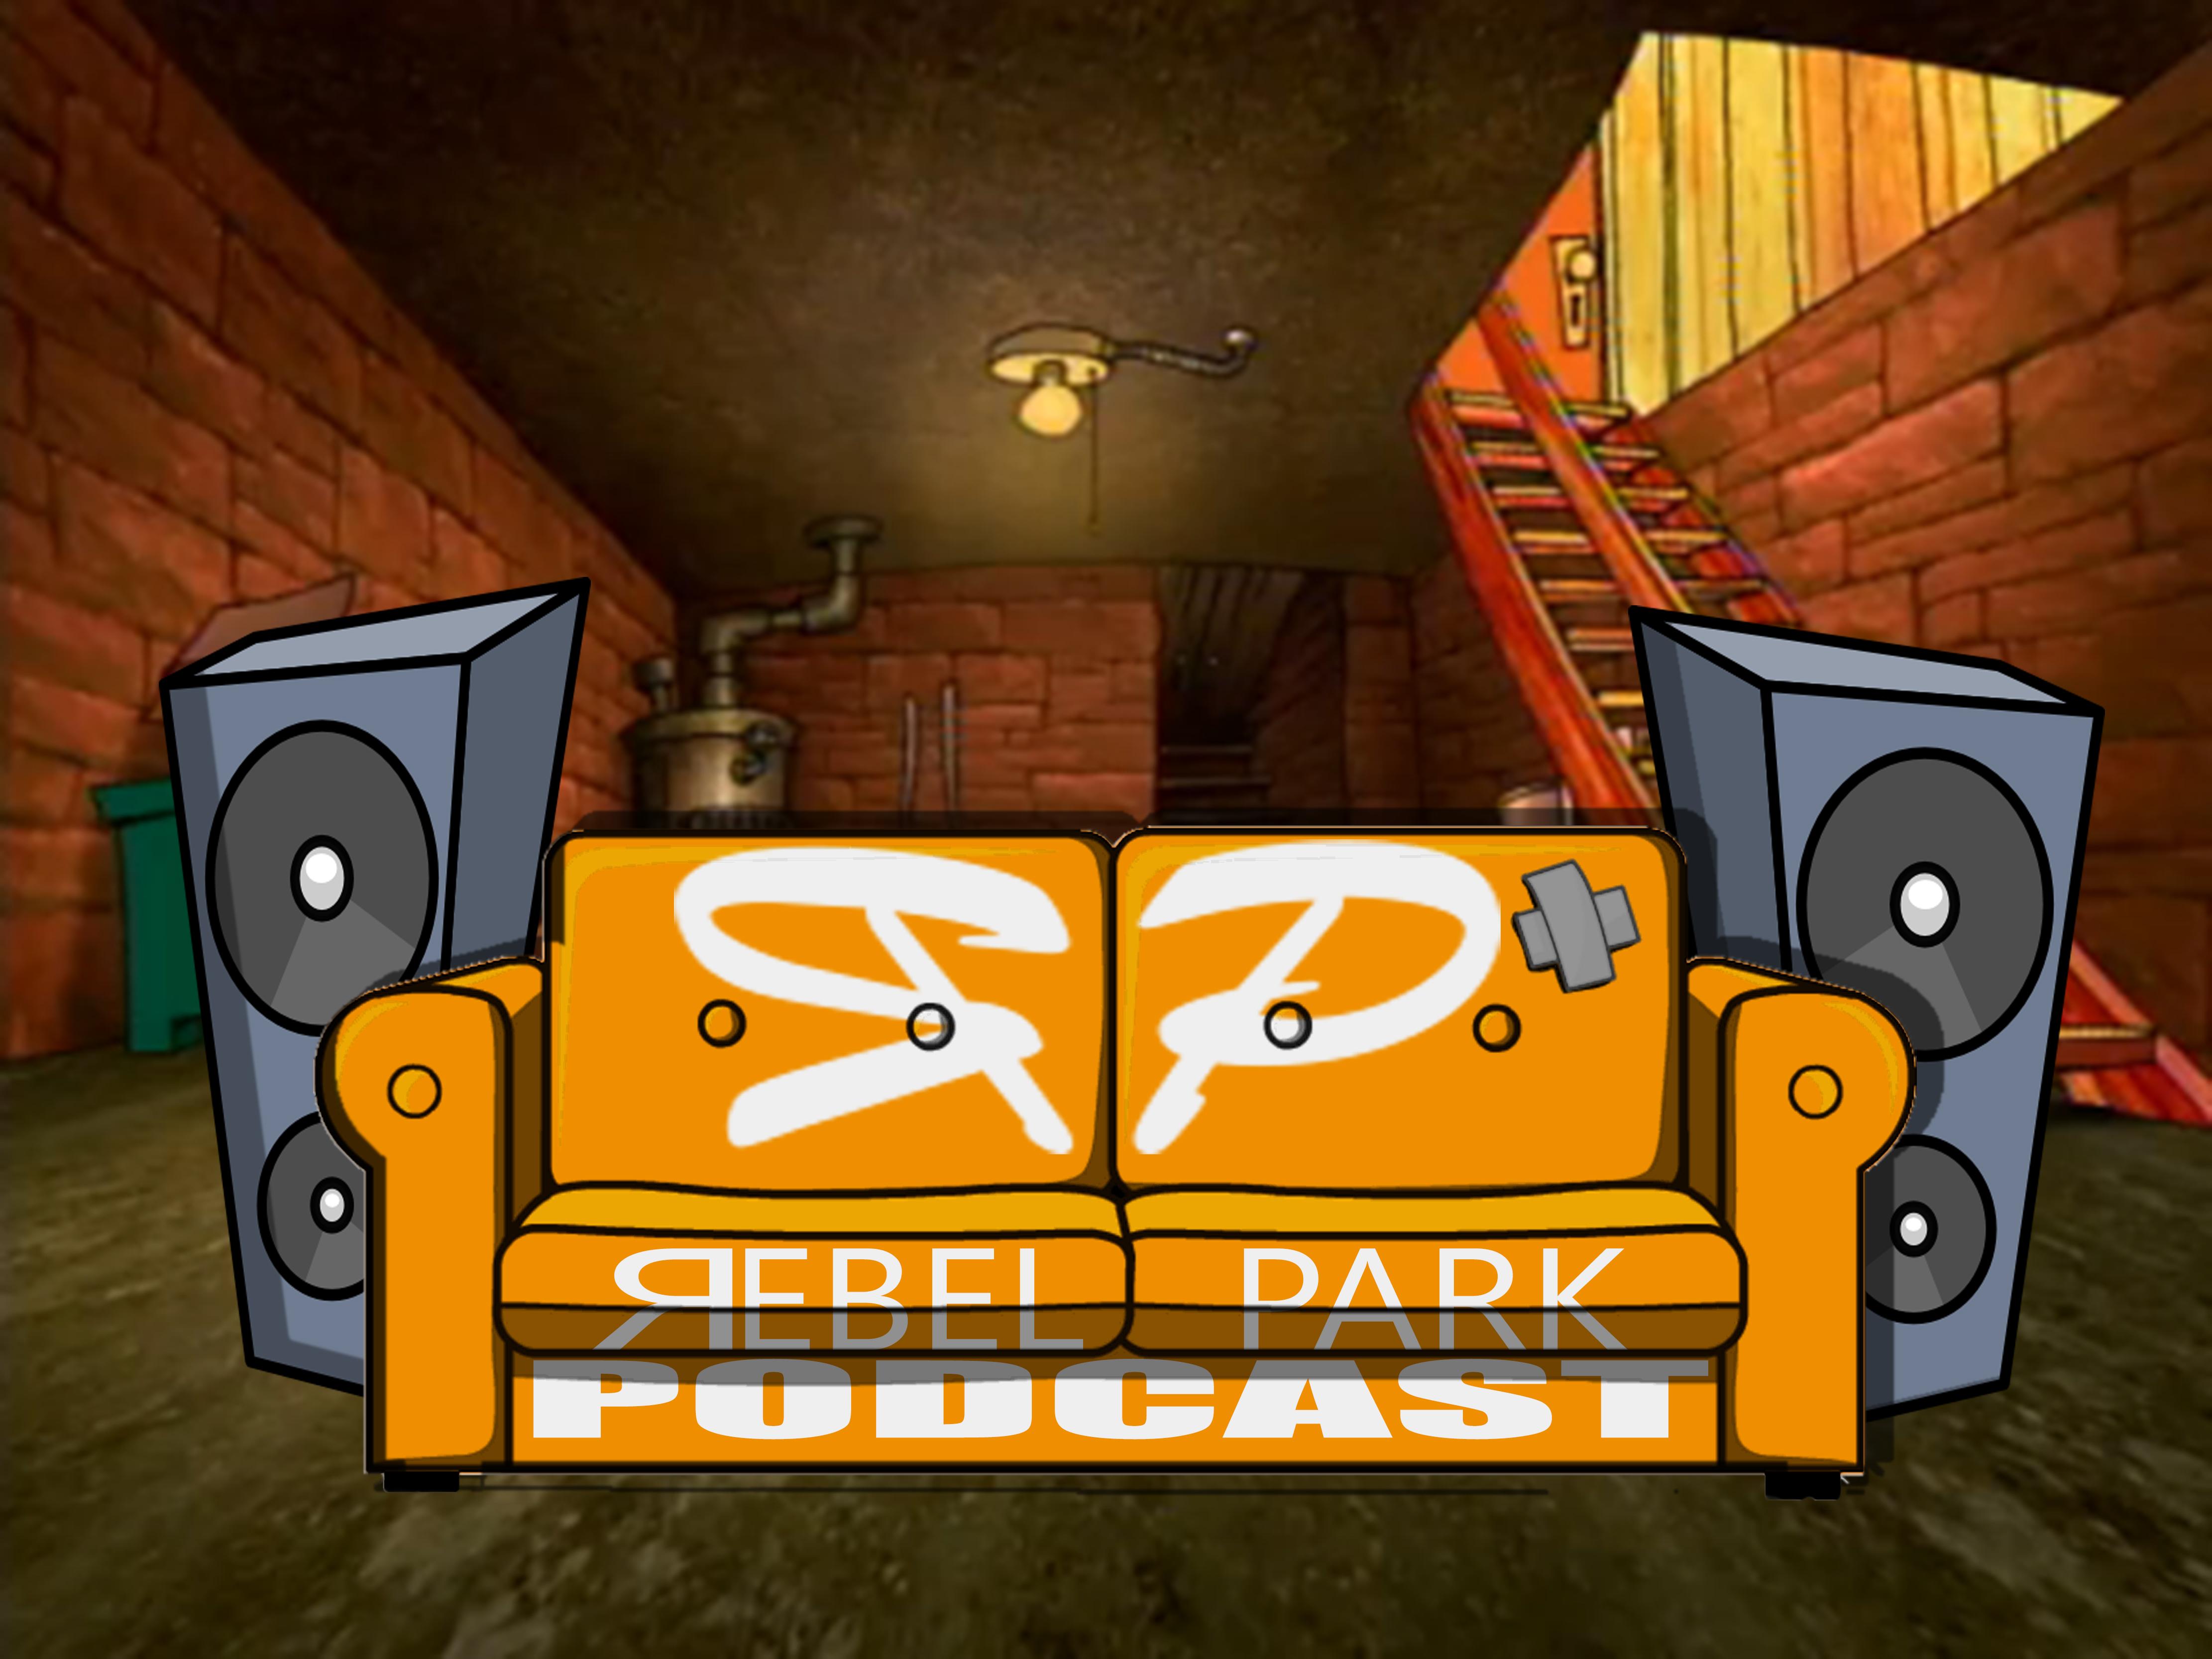 Rebel Park Podcast